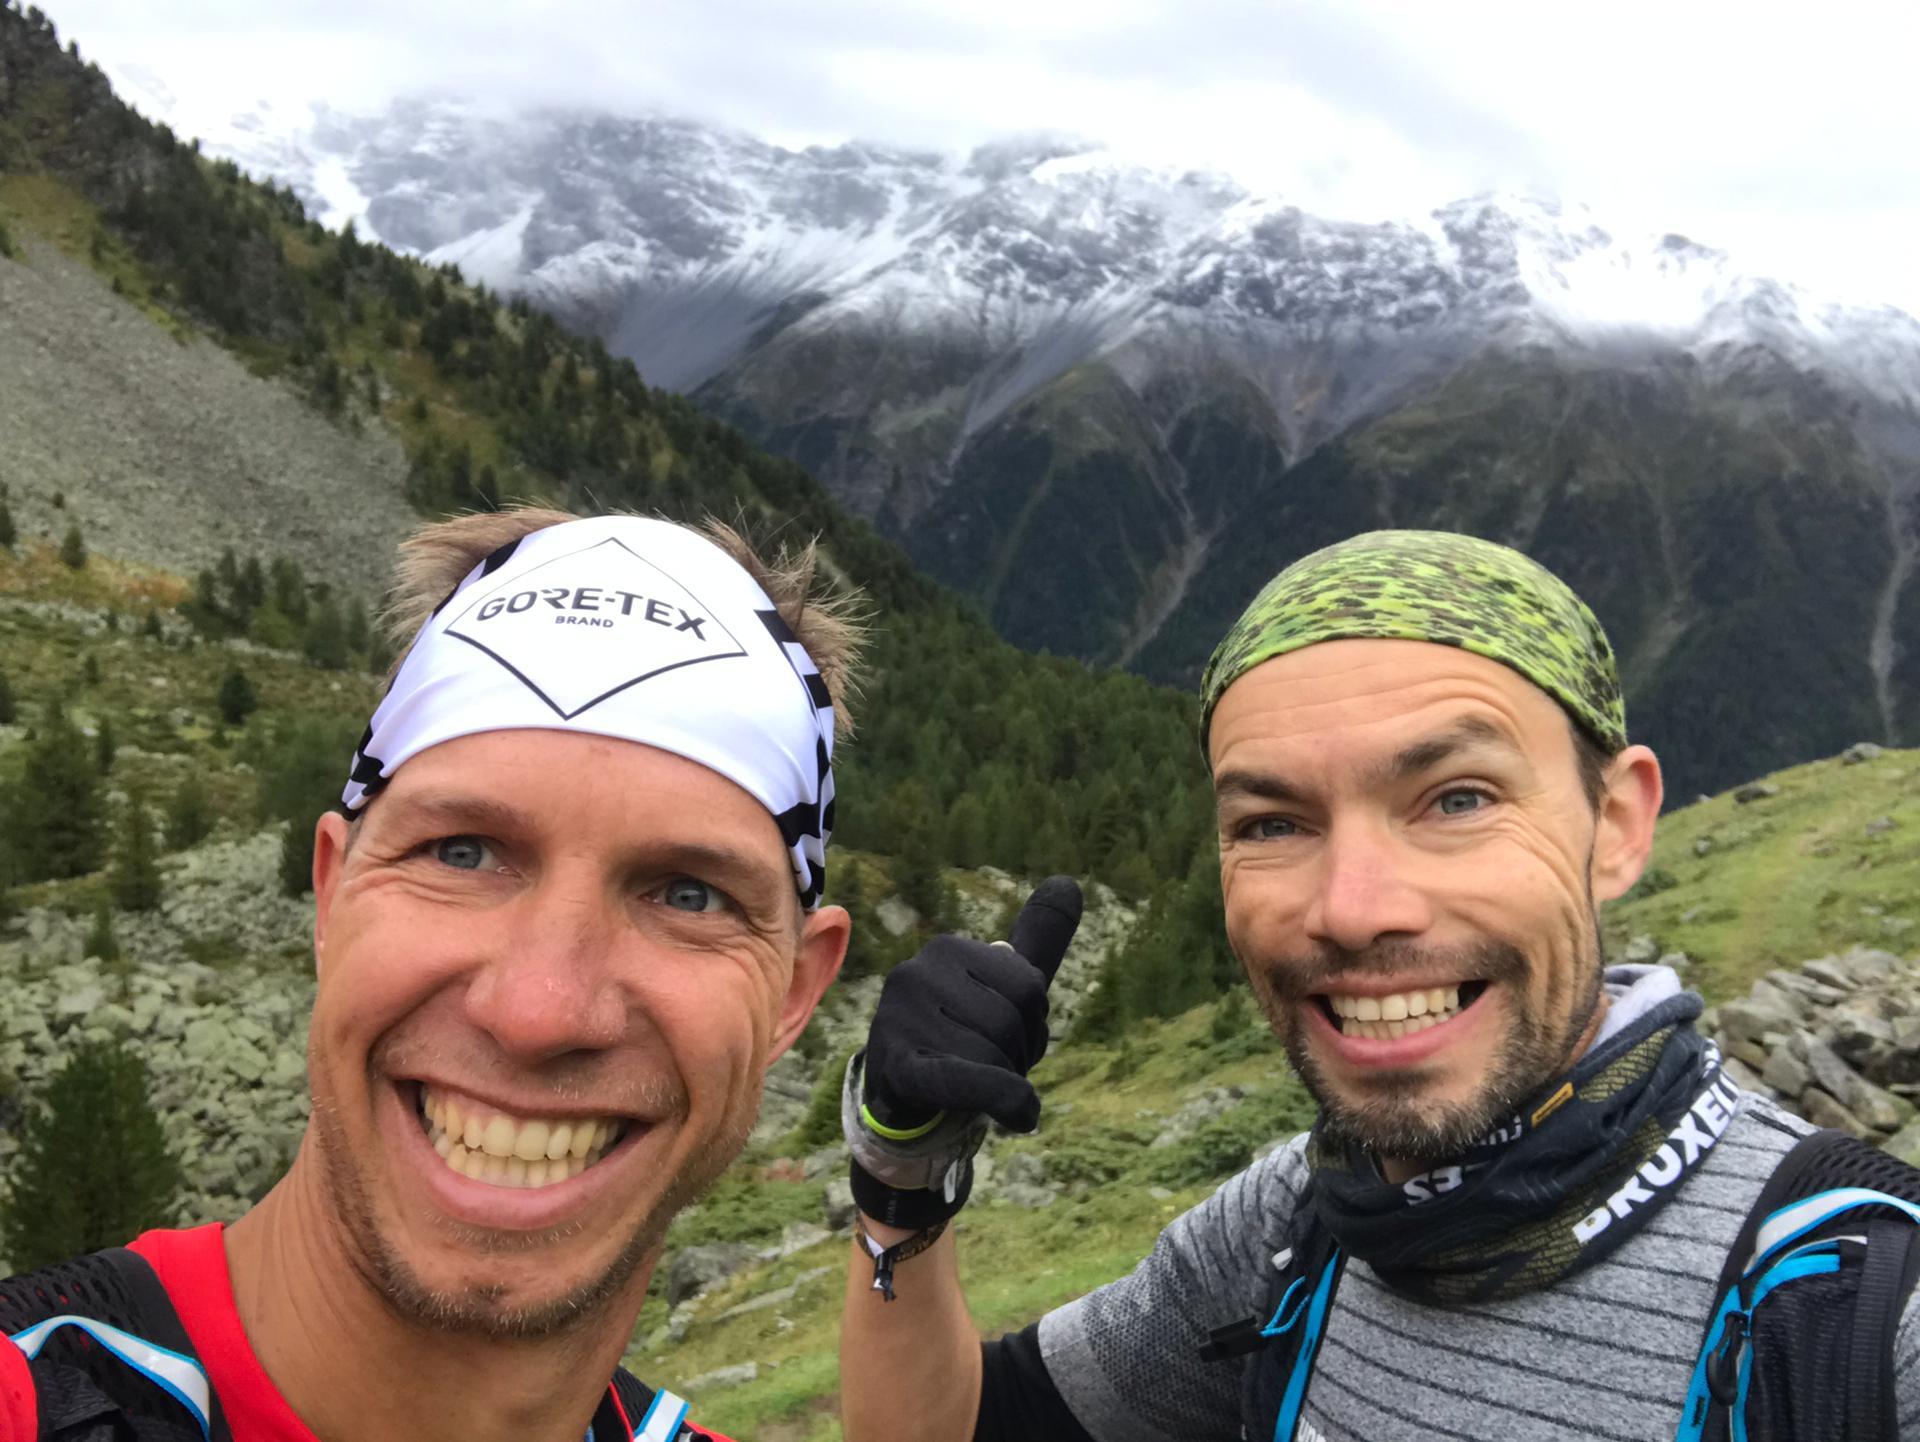 team_runners_lab_transalpine_run_alpen_trail_running_koen_krijn_king_of_the_world